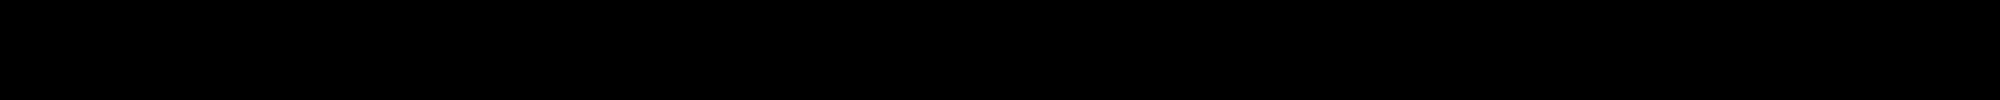 Barra-Negra-Inferior.png